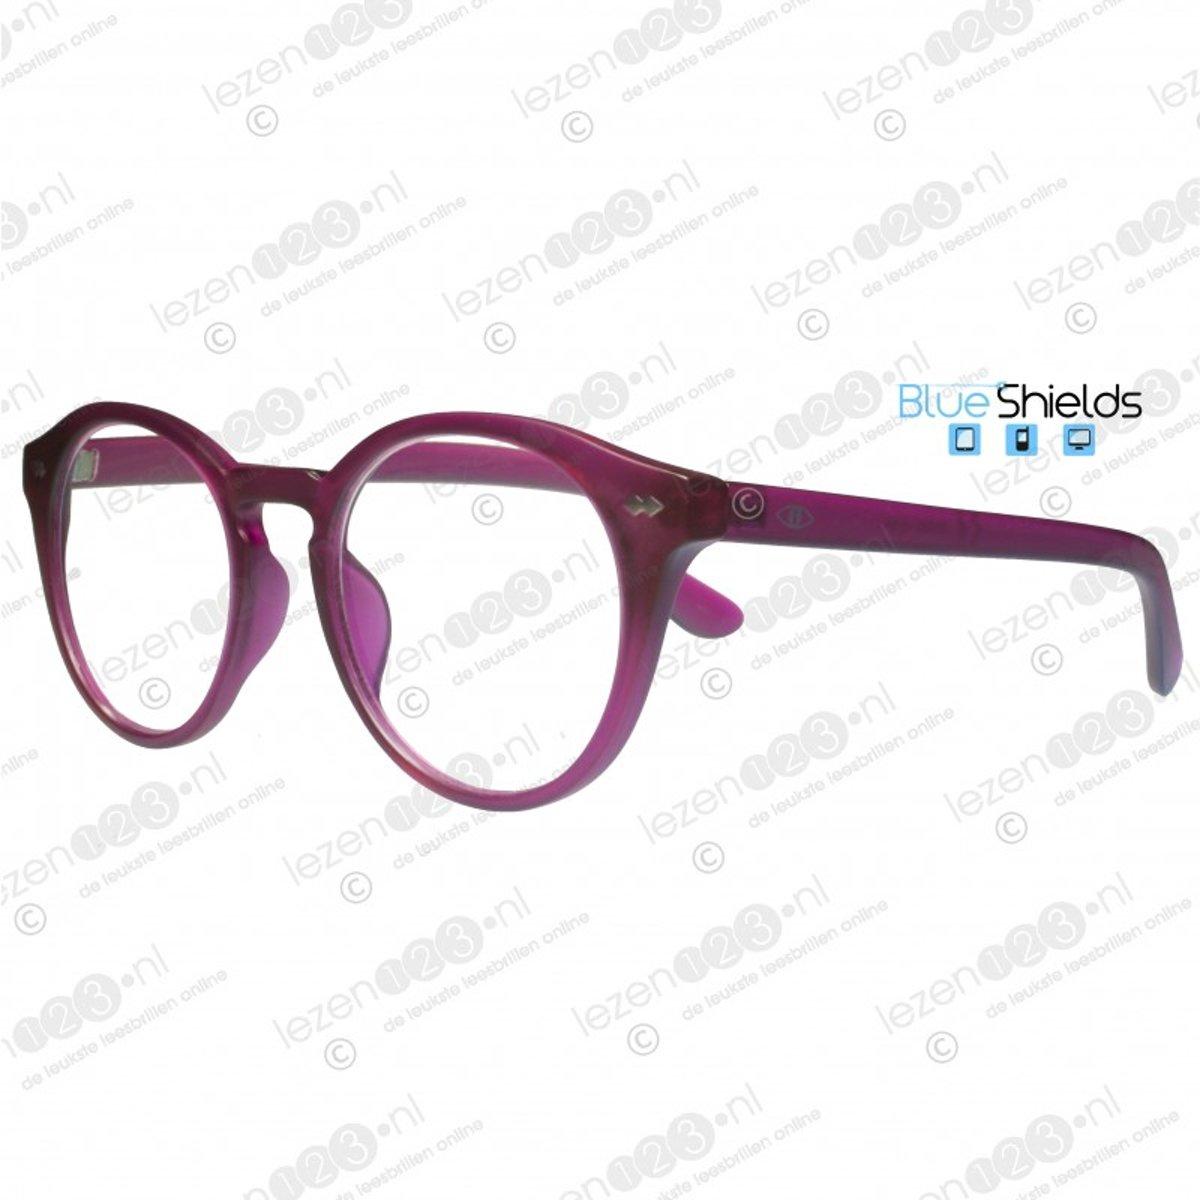 Icon Eyewear KFI340 +1.50 Jamie BlueShields Leesbril - blauw licht filter lens - Framboos kopen